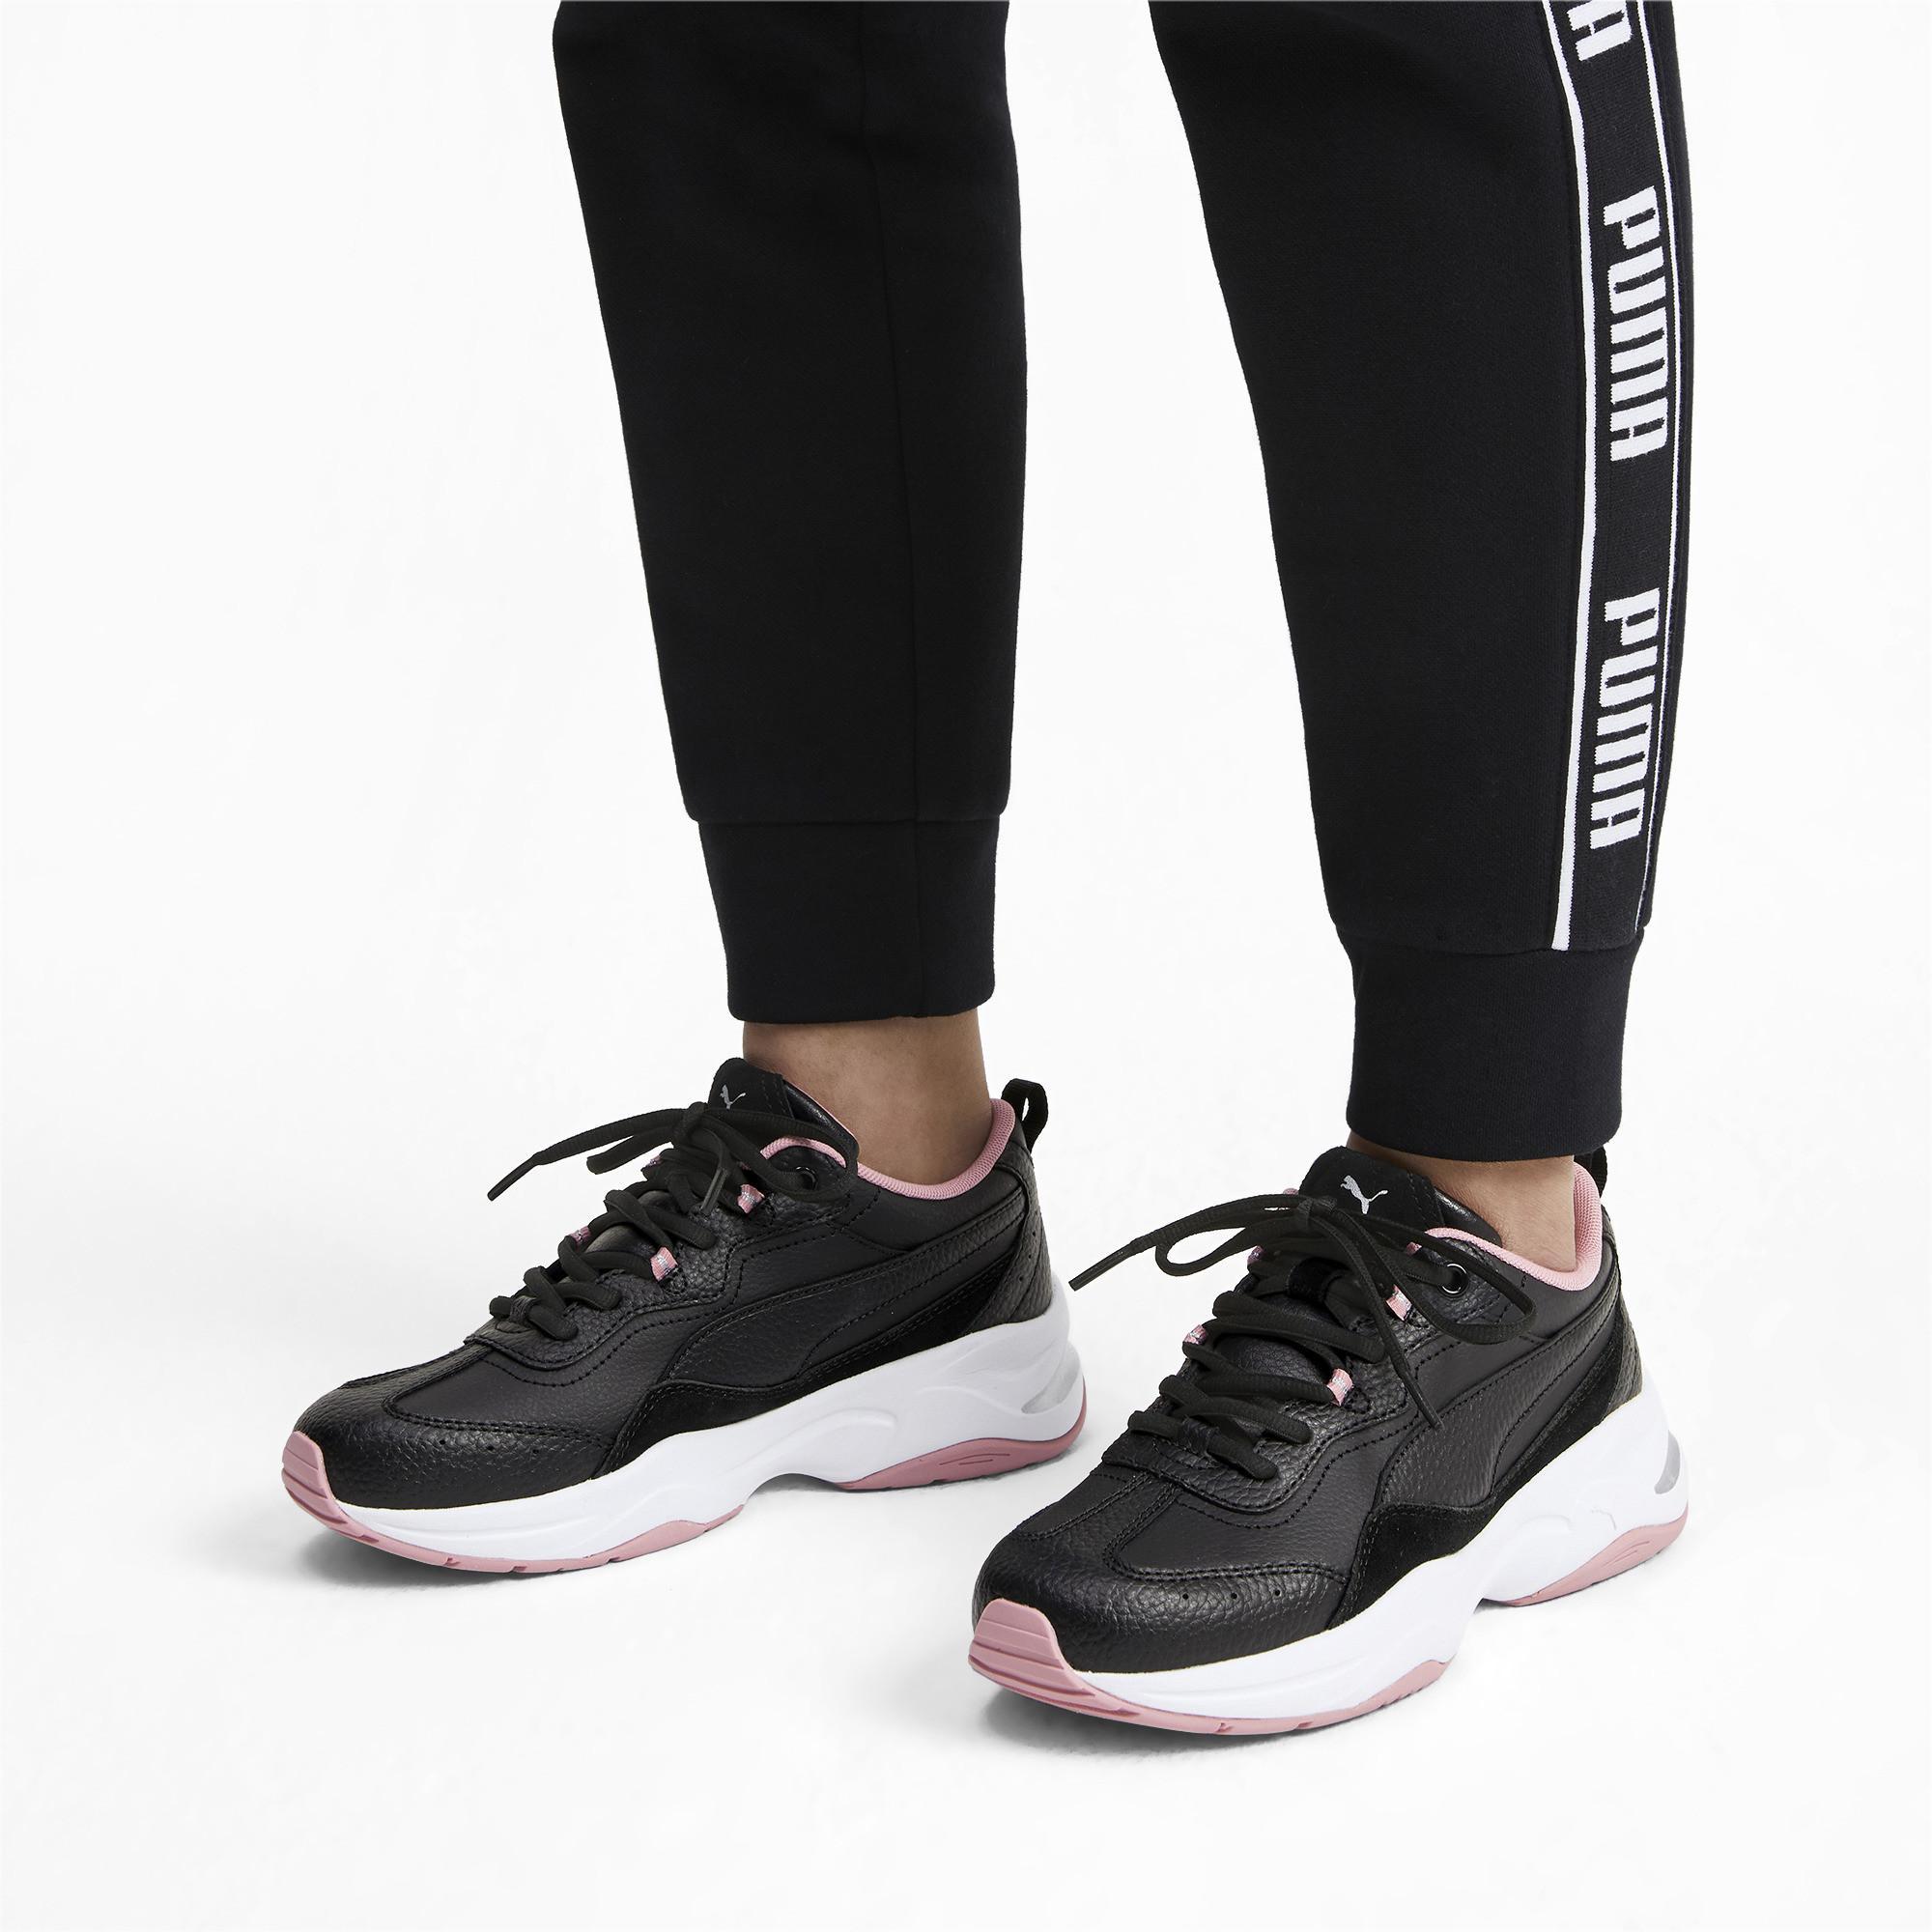 PUMA Leather Cilia Lux Women's Sneakers